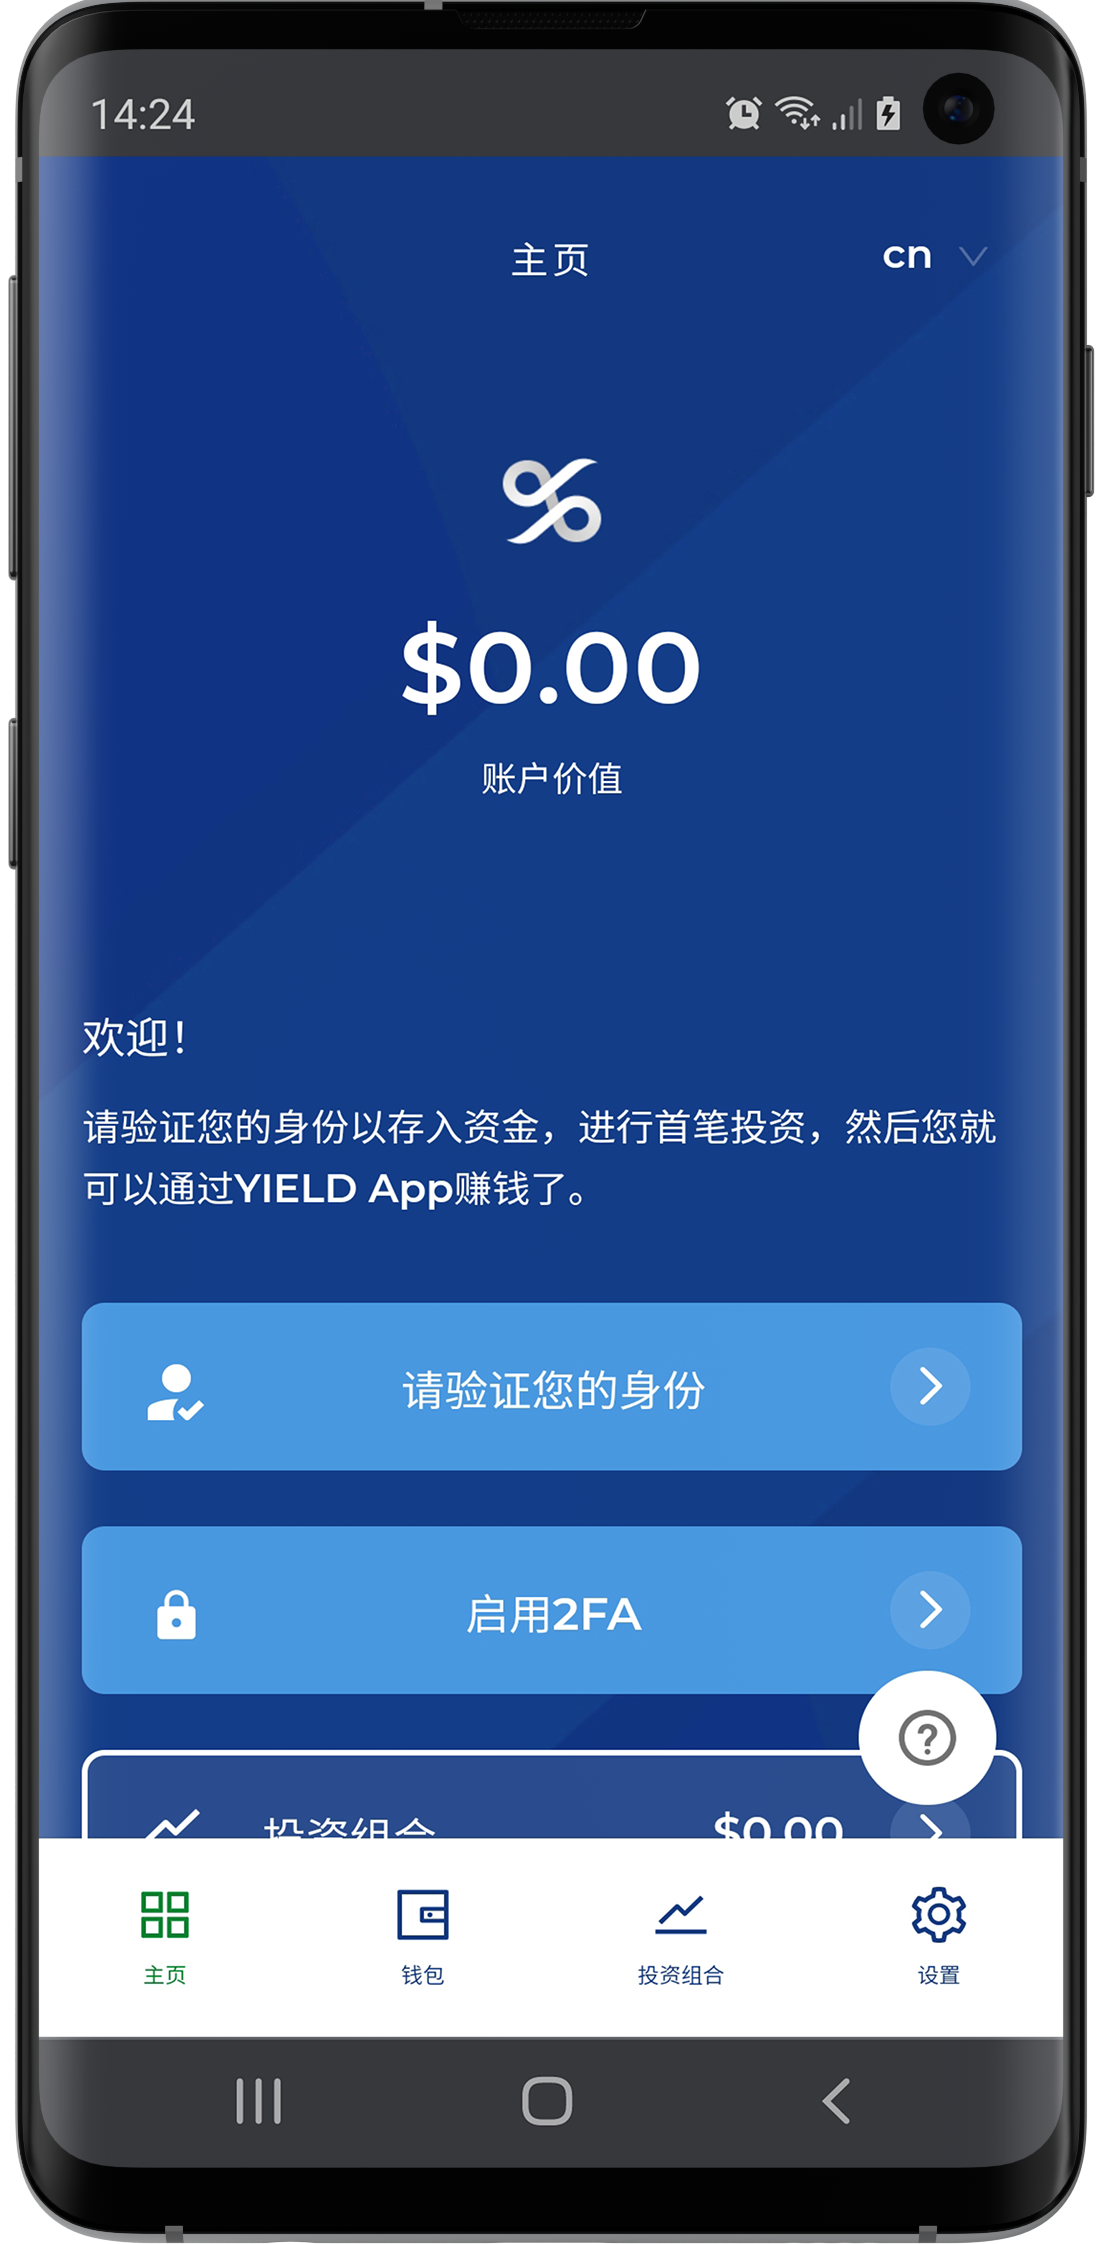 CN_Dashboard.png